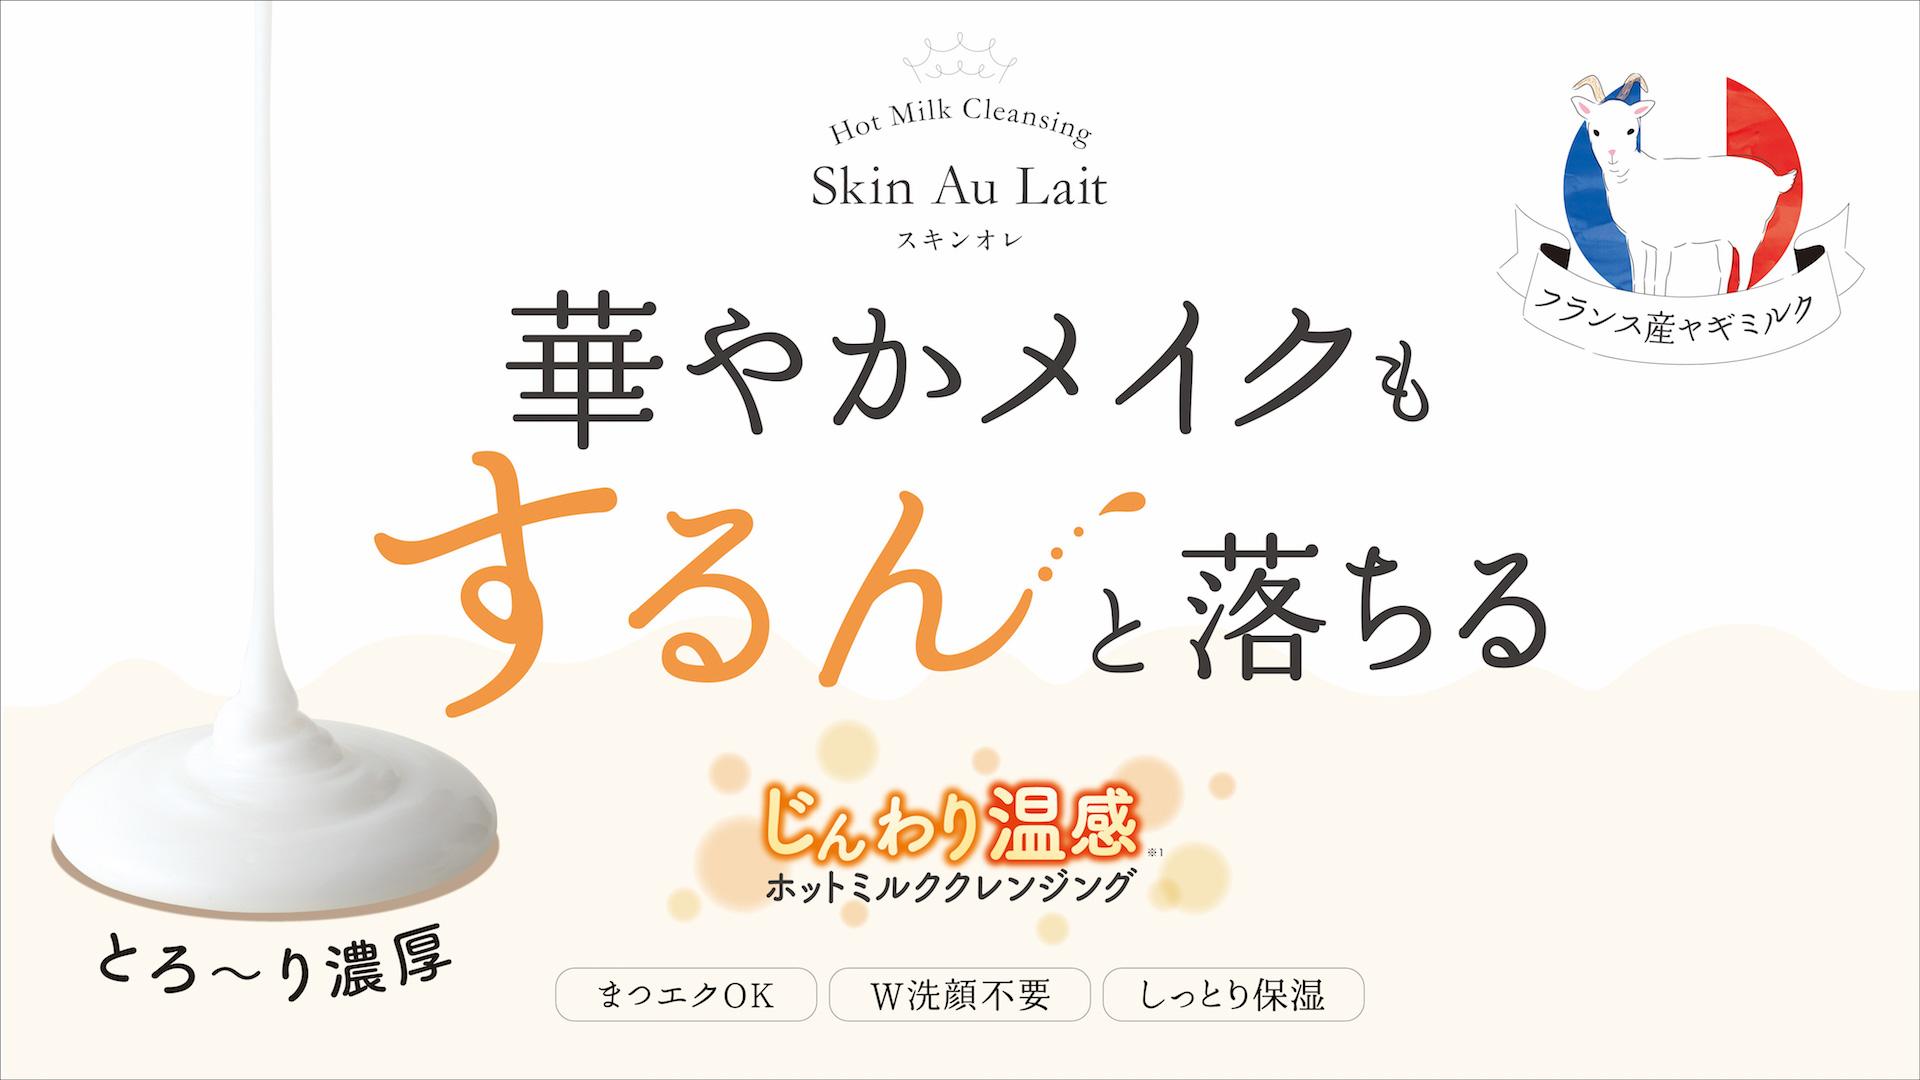 Skin Au Lait